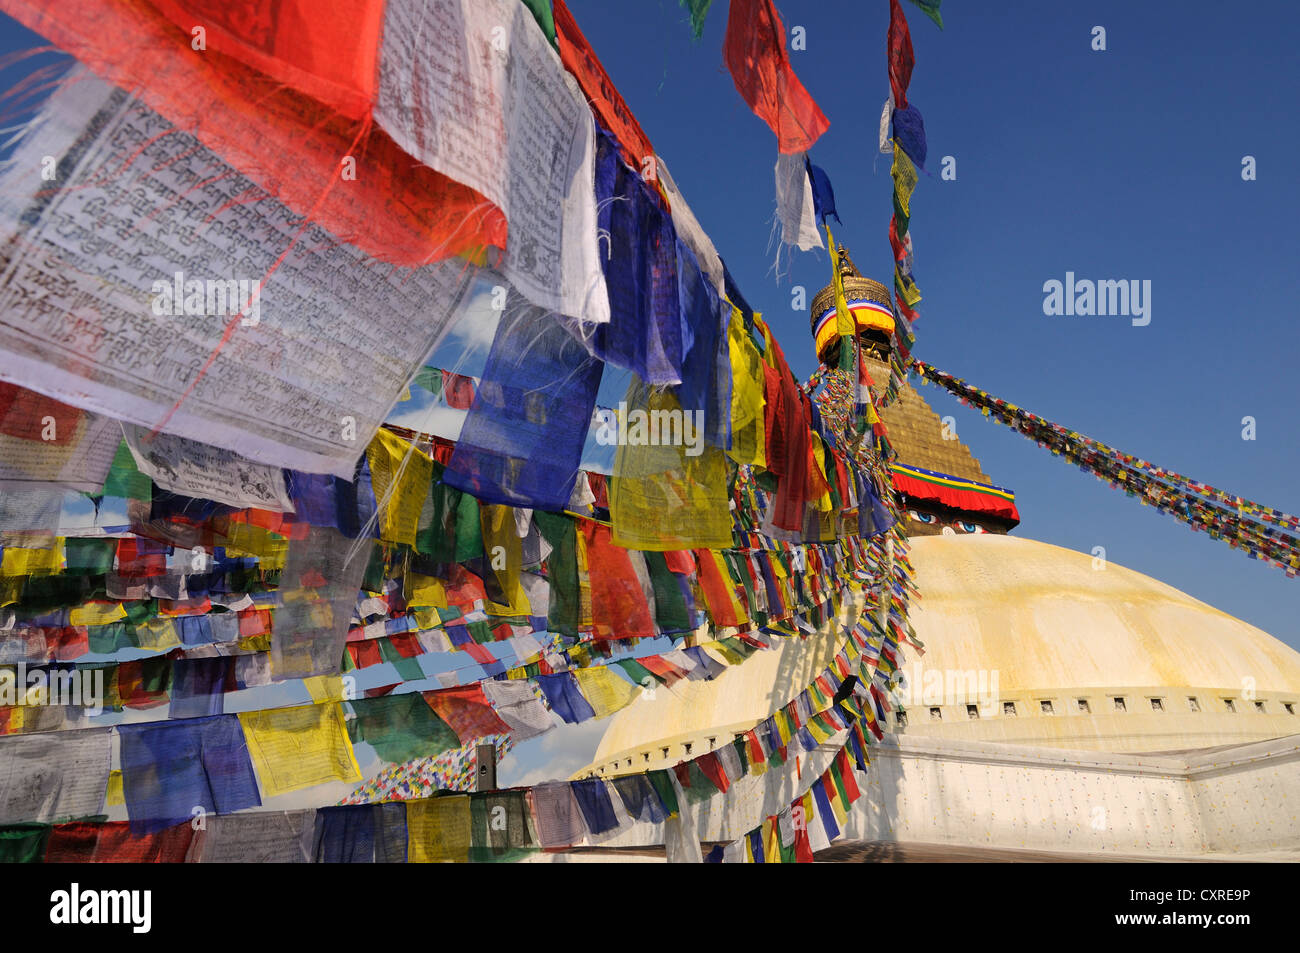 Prayer flags on the Bodnath Stupa, Kathmandu, Kathmandu Valley, Nepal, Asia - Stock Image